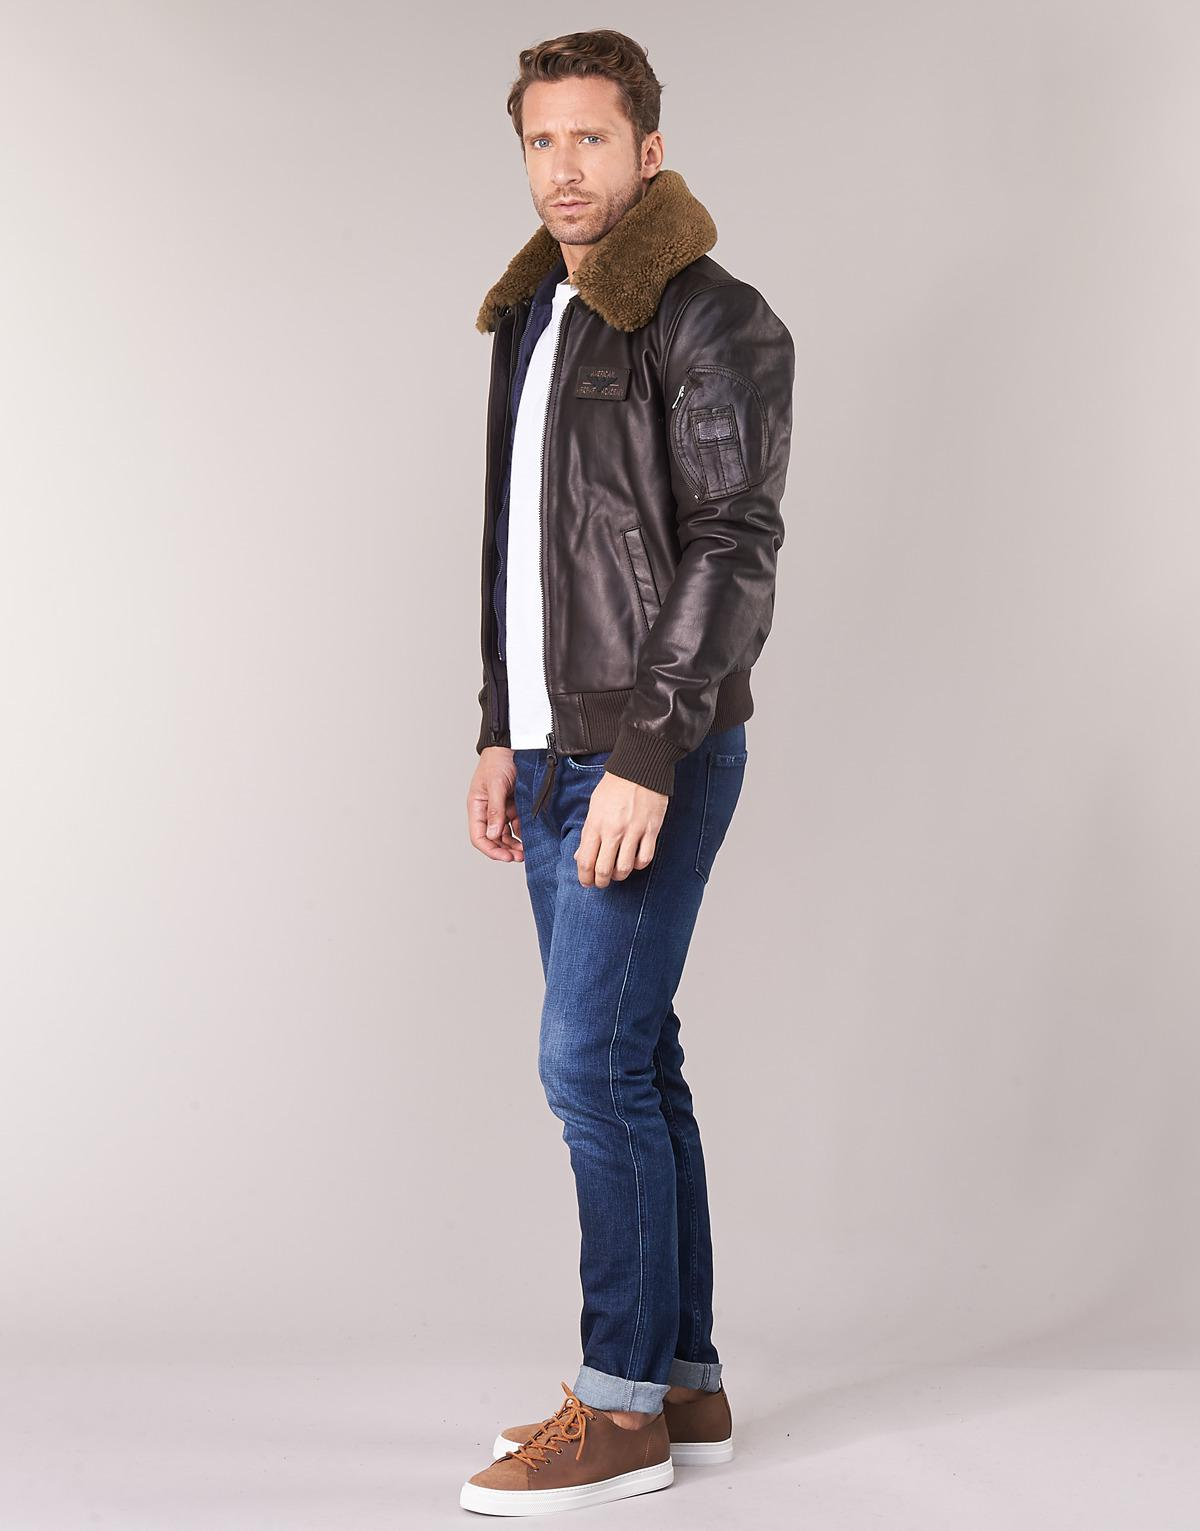 Redskins Commander Striking Leather Jacket in Brown for Men - Lyst 72d264a25a5